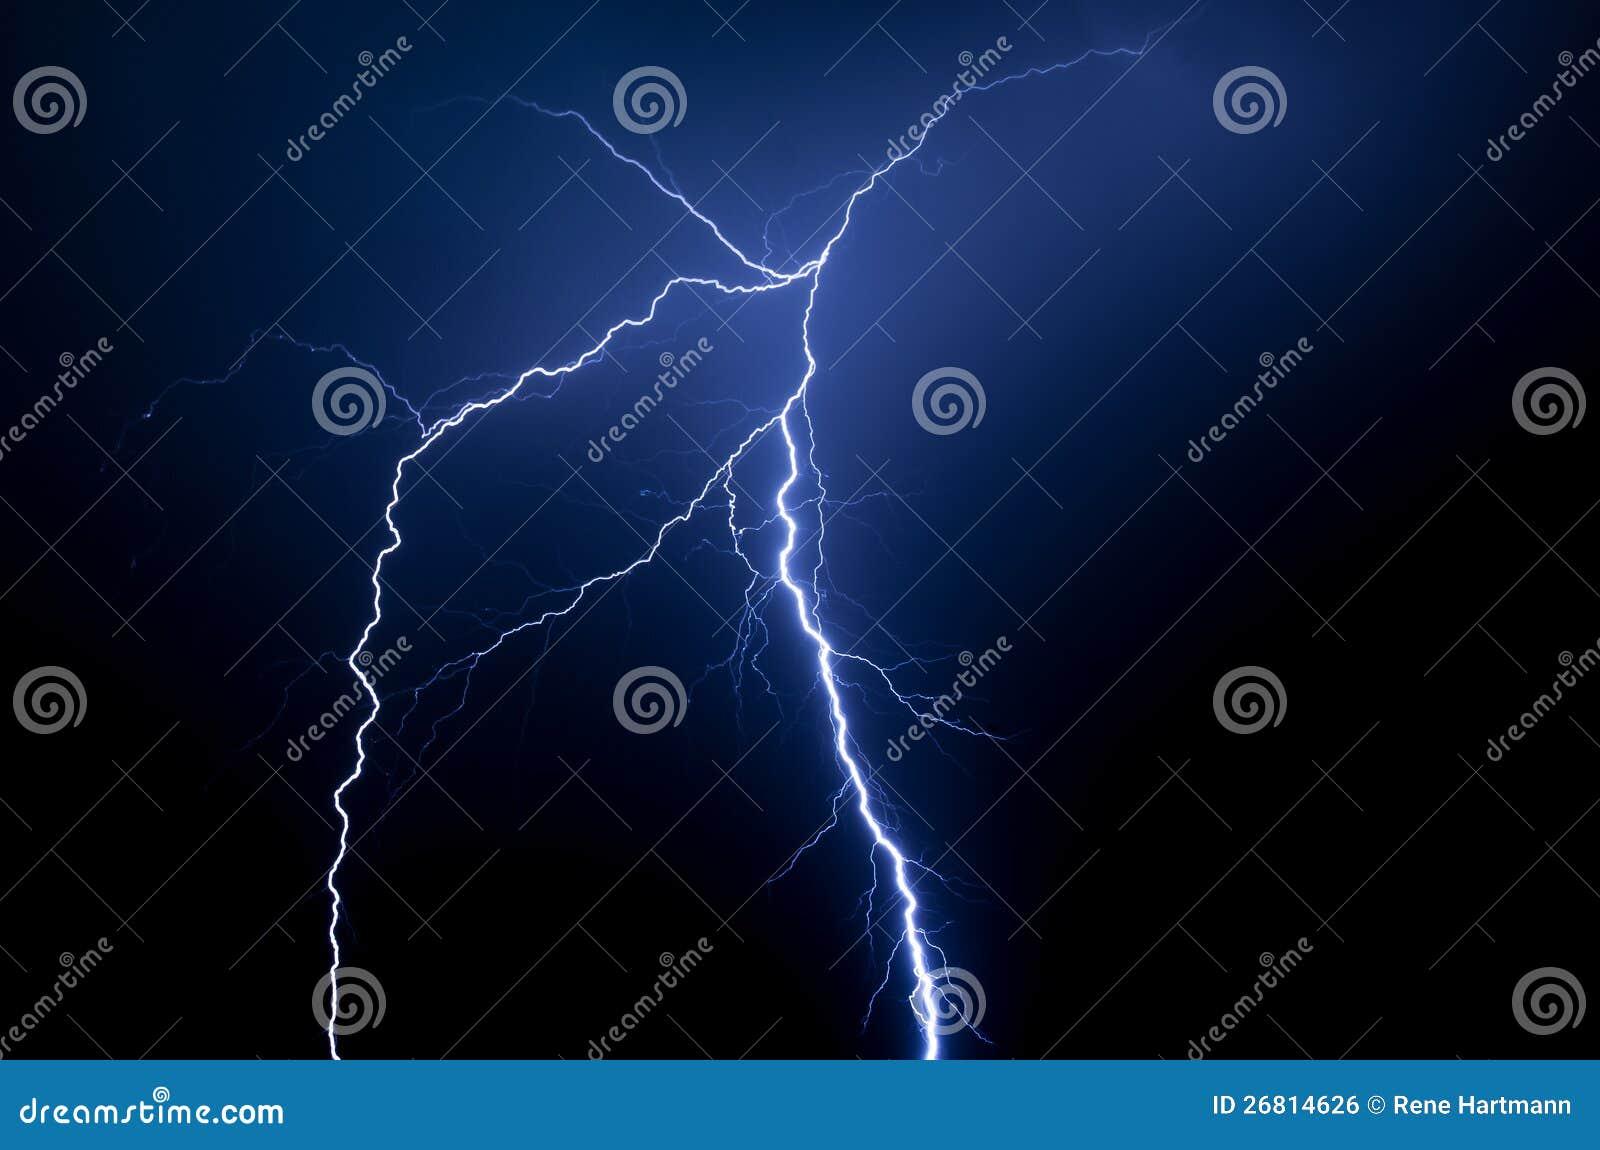 Spectacular blue lightning strike at night